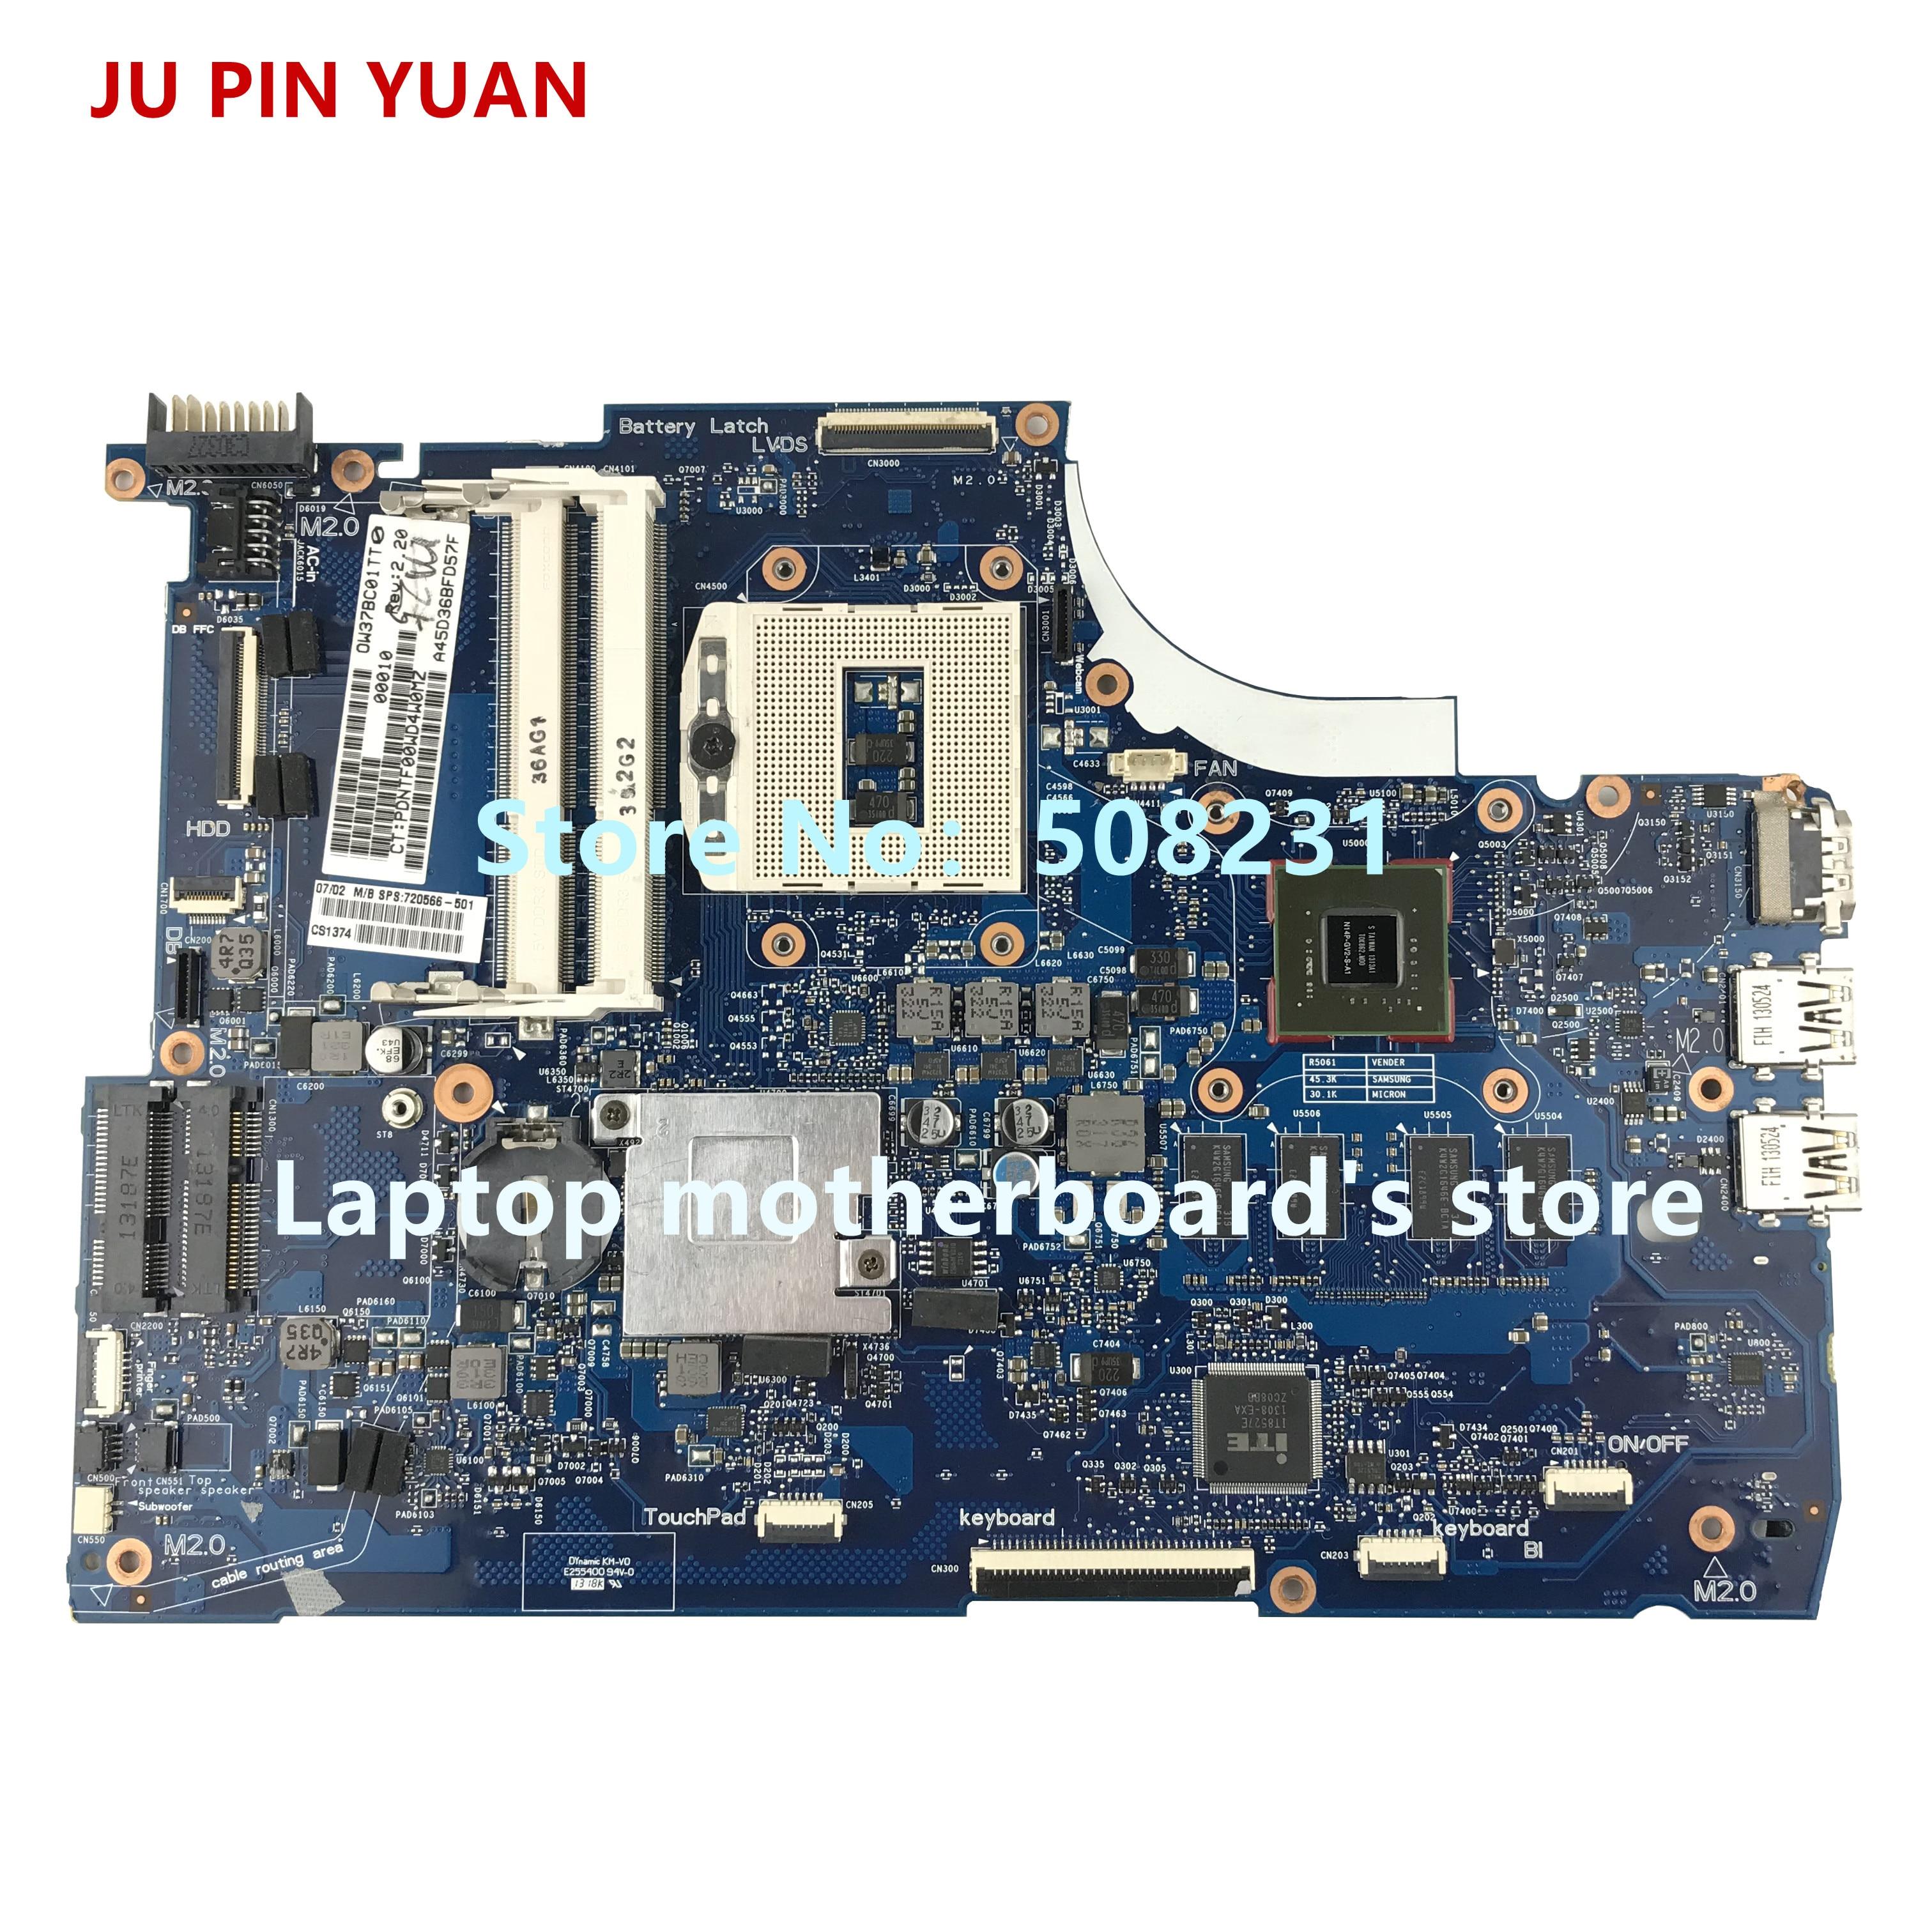 JU PIN YUAN 720566-501 720566-001 720566-601 mainboard for HP ENVY 15-J 15T-J laptop motherboard 740M 2G HM87 PGA947